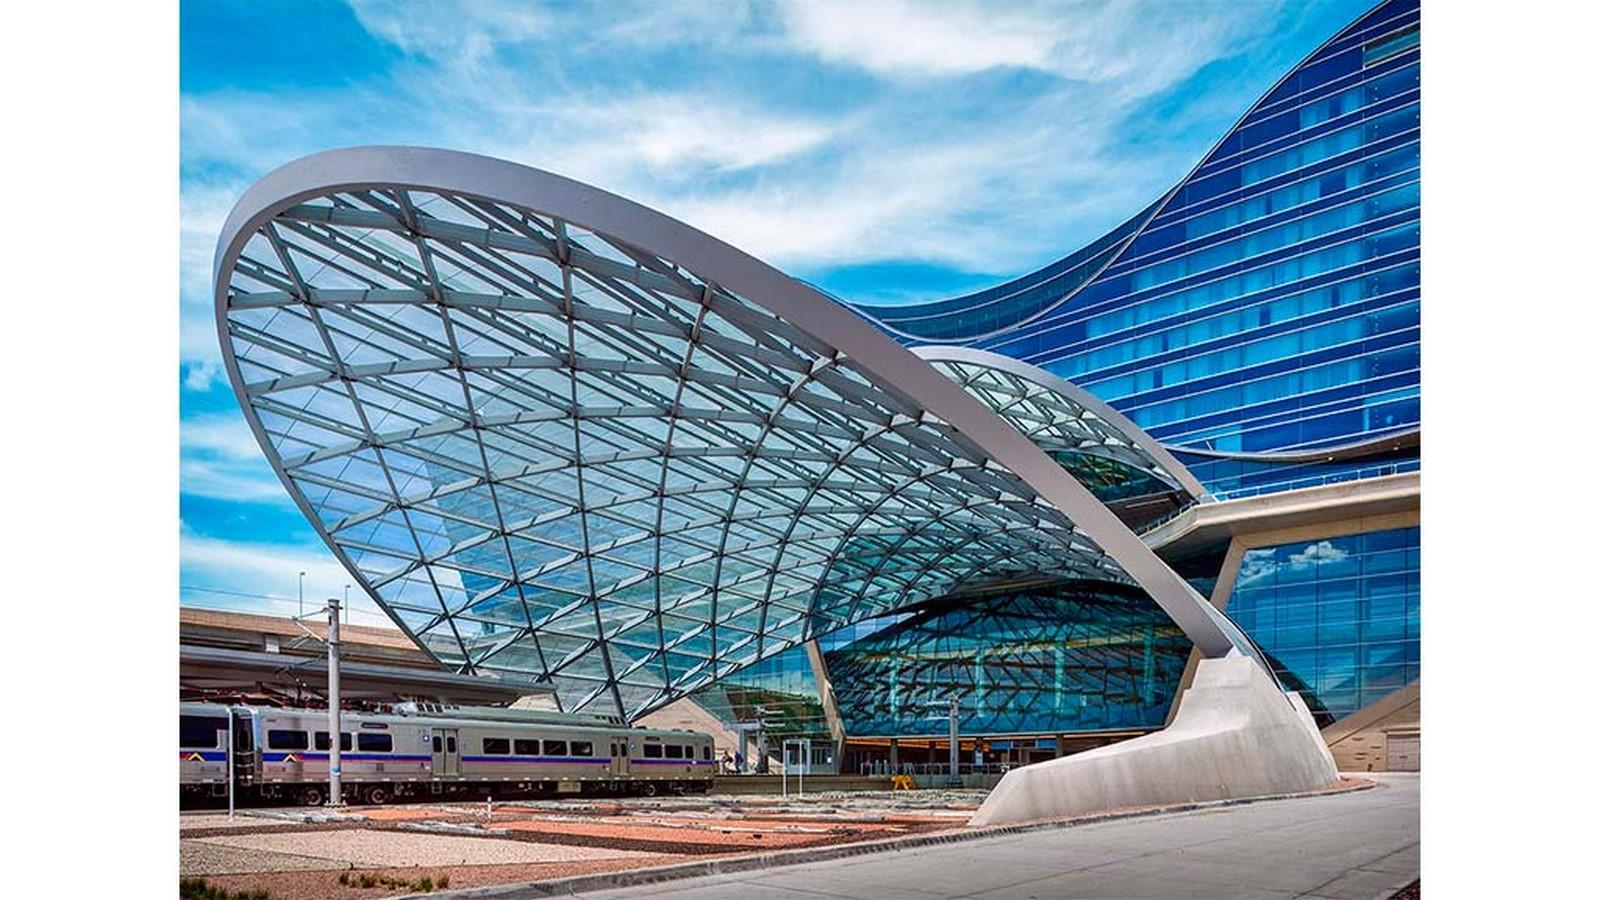 Westin DEN Hotel and Transit Center - Denver International Airport (DEN) - Sheet2